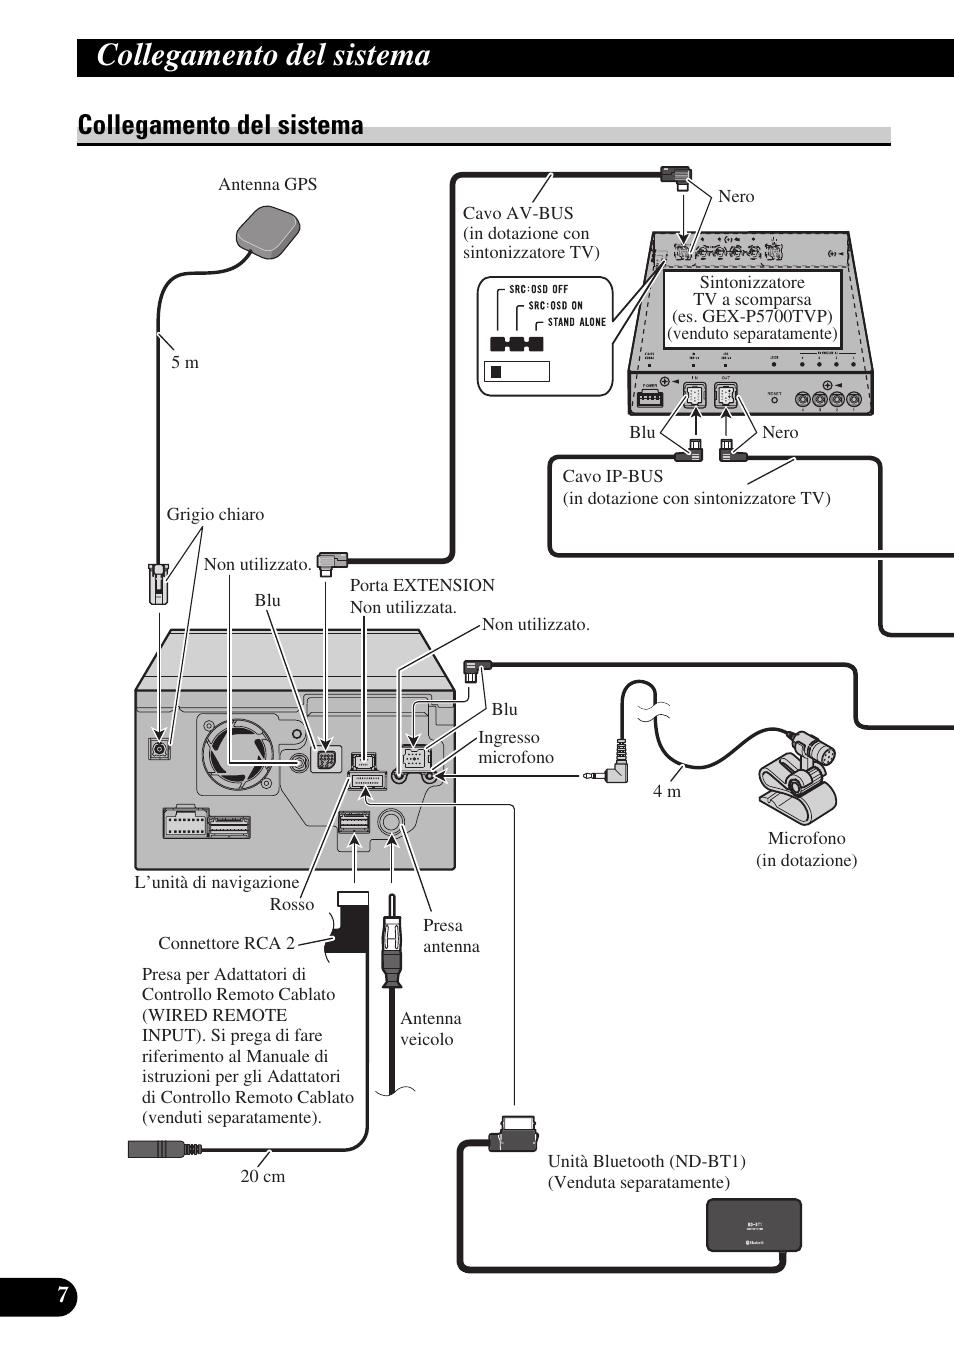 Collegamento del sistema | Pioneer AVIC-HD3 User Manual